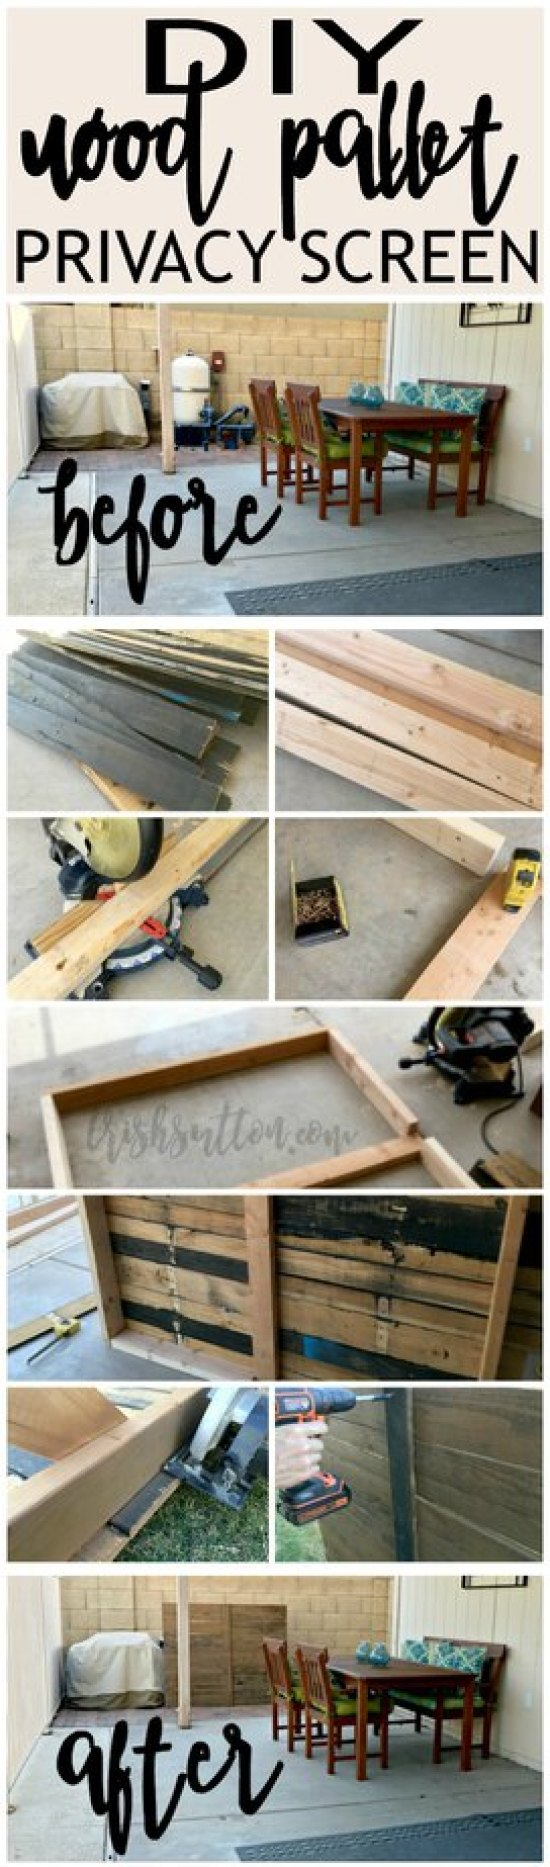 DIY Outdoor Wood Pallet Privacy Screen; Hide garbage cans, pool pumps, outdoor tools. TrishSutton.com